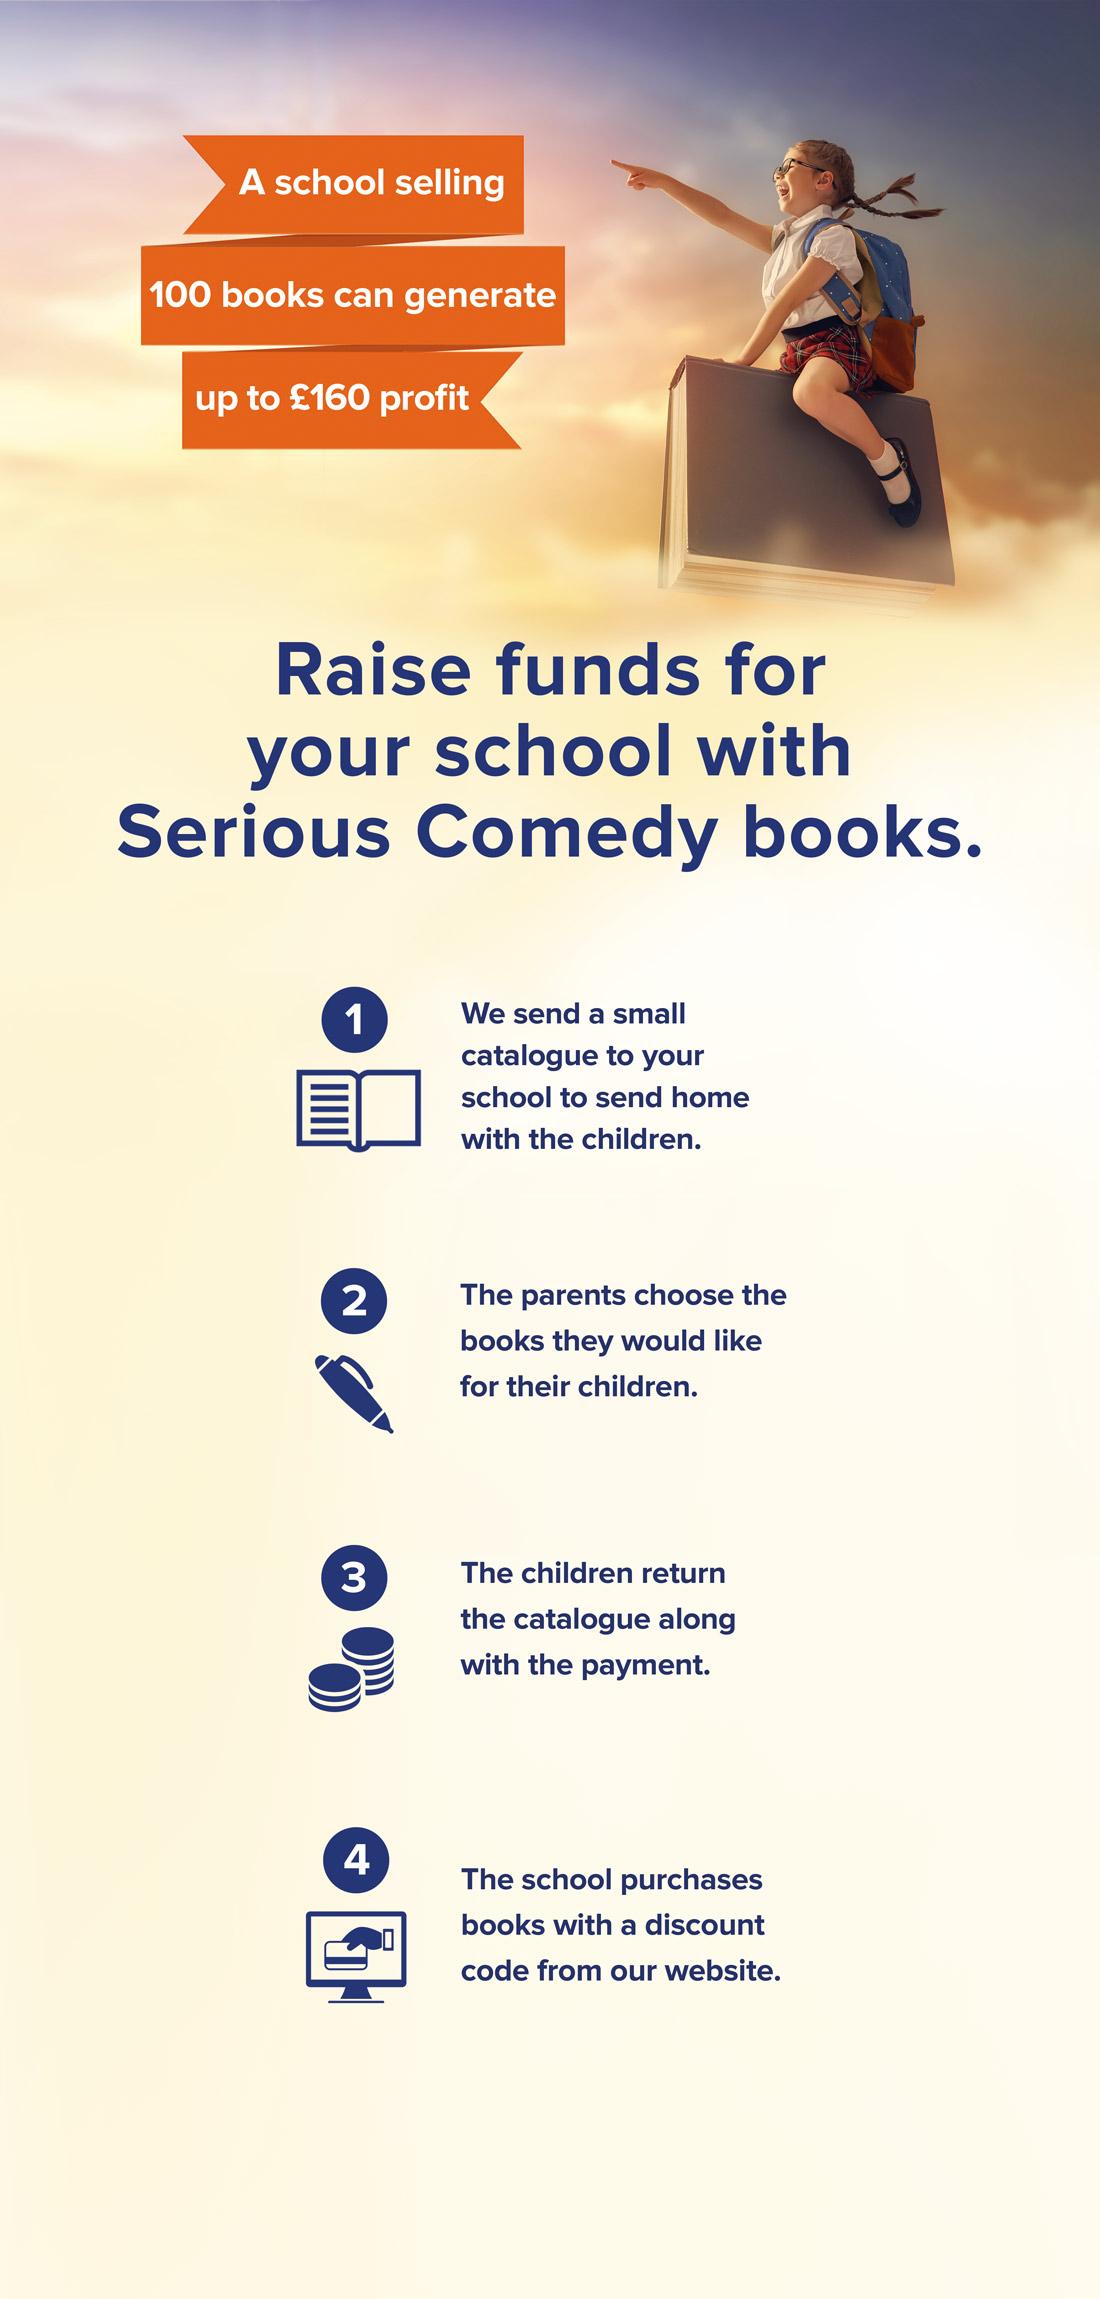 Books-funds-schools.jpg